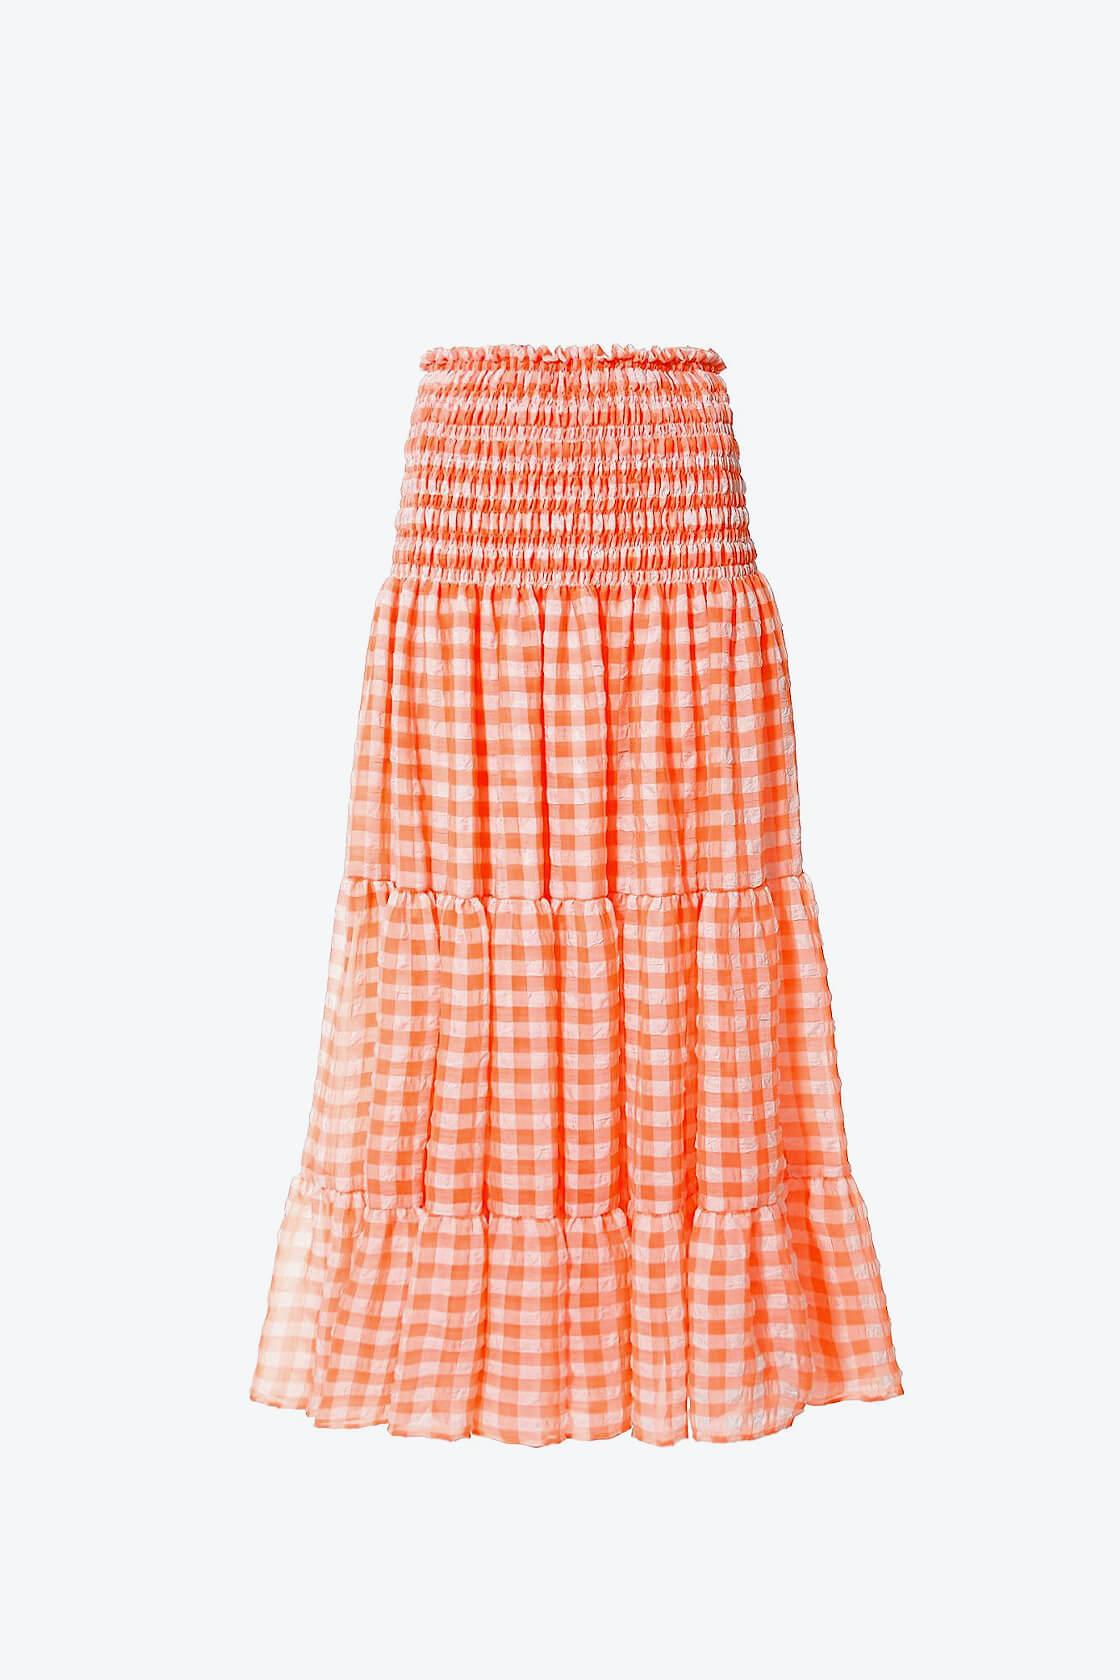 OL100002590 Skirt Lola Bright Marigold1